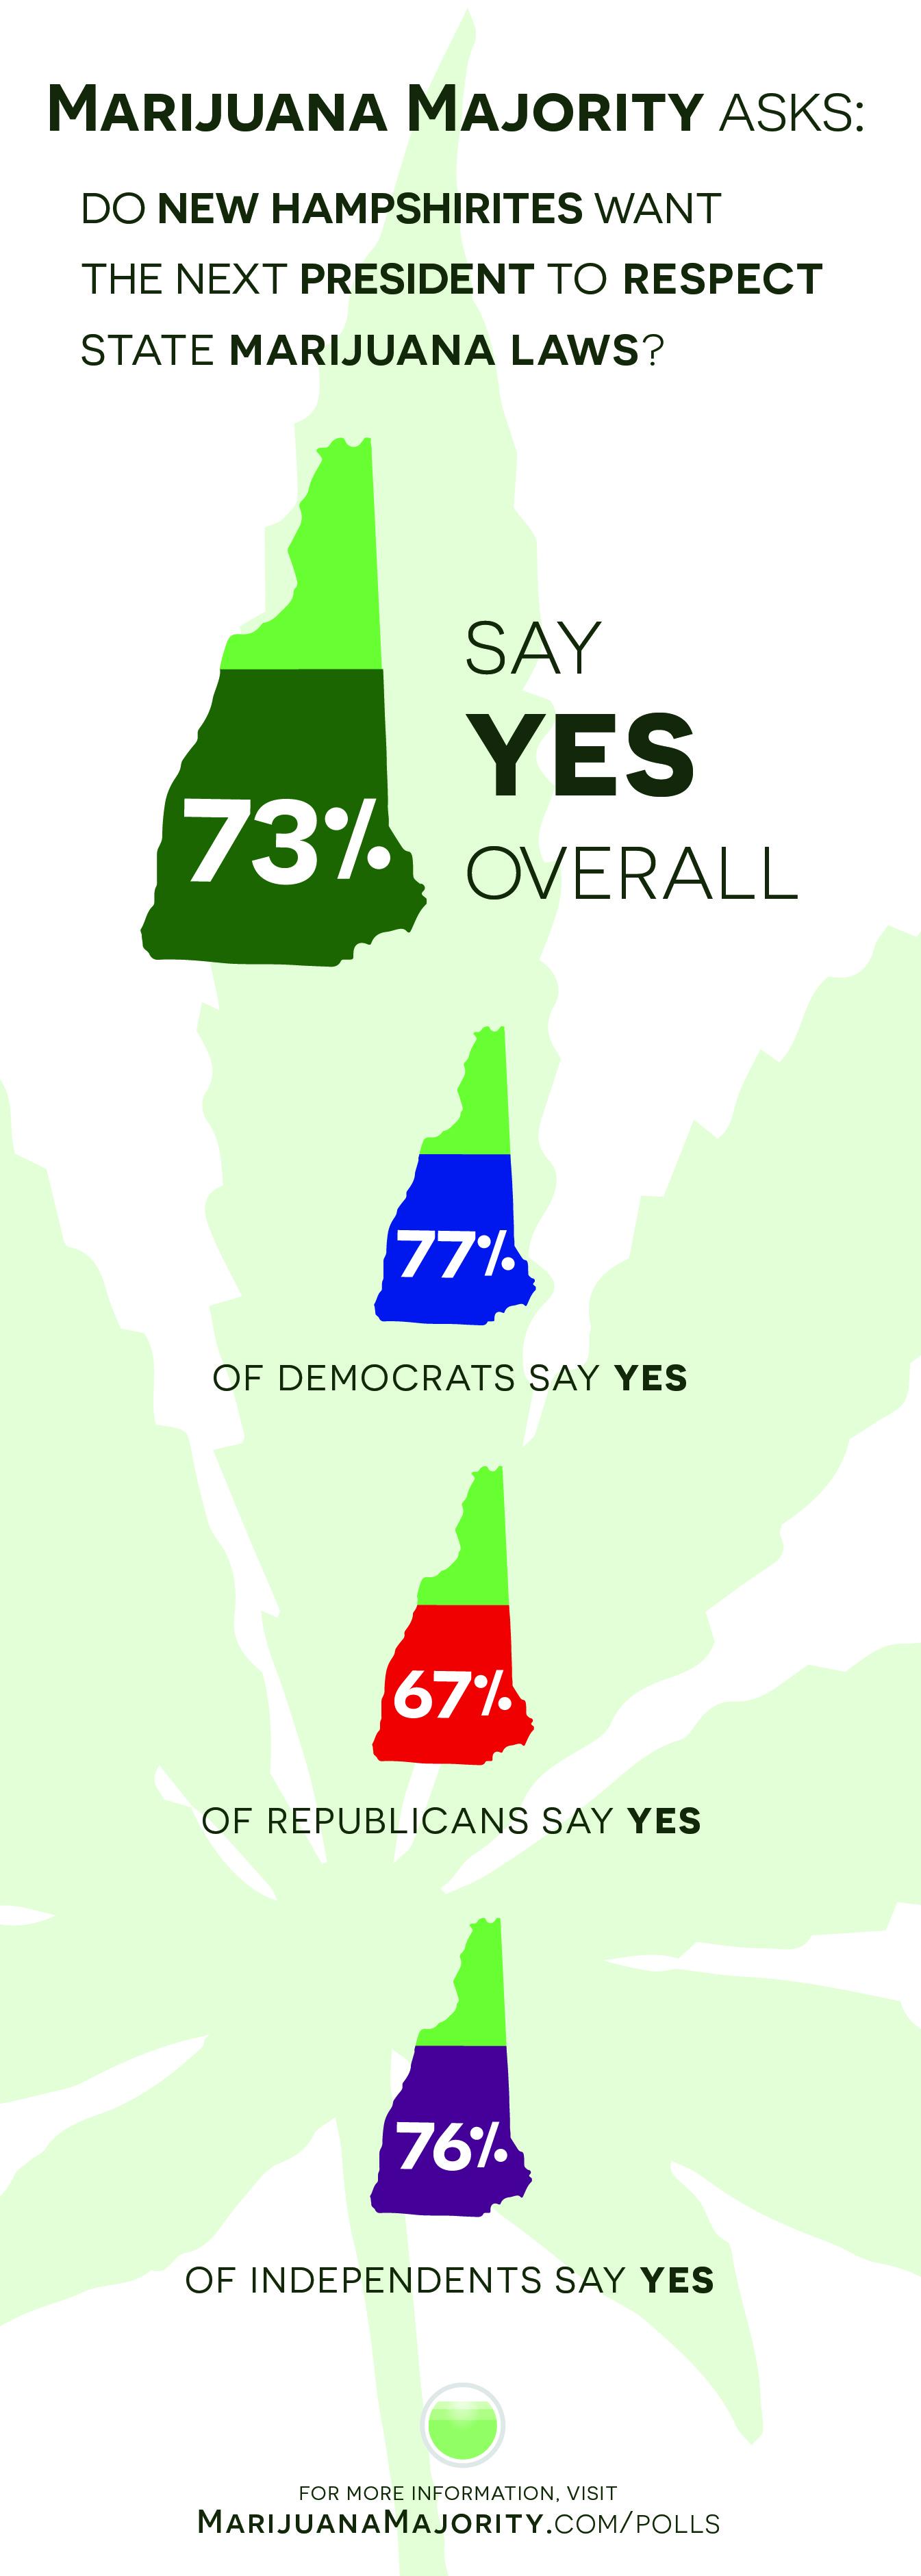 New Hampshire Iowa marijuana majority poll results infographic